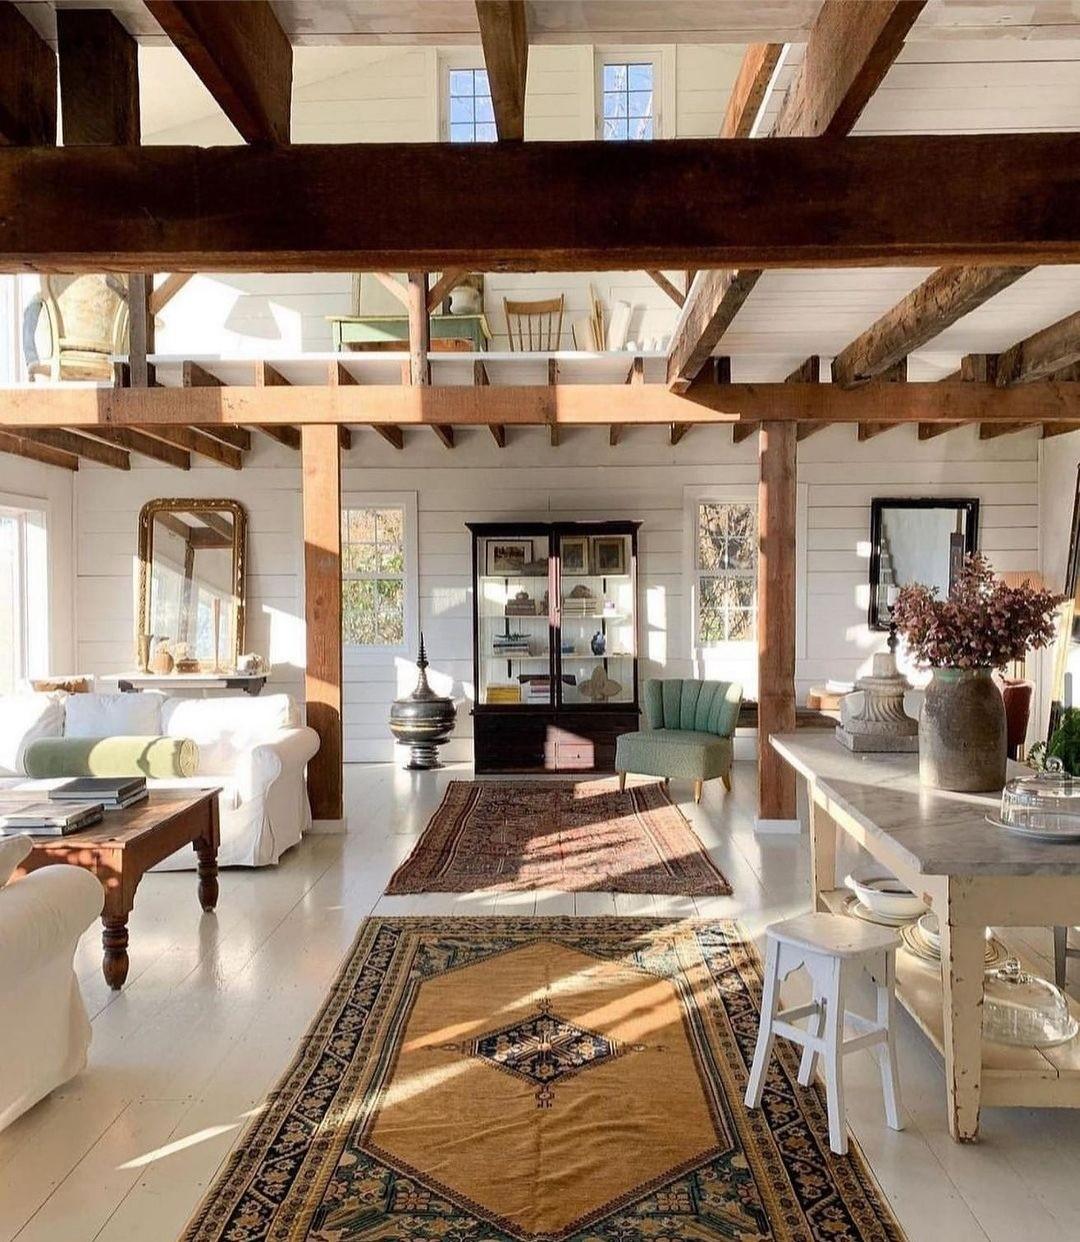 architecture, home, and interior design image